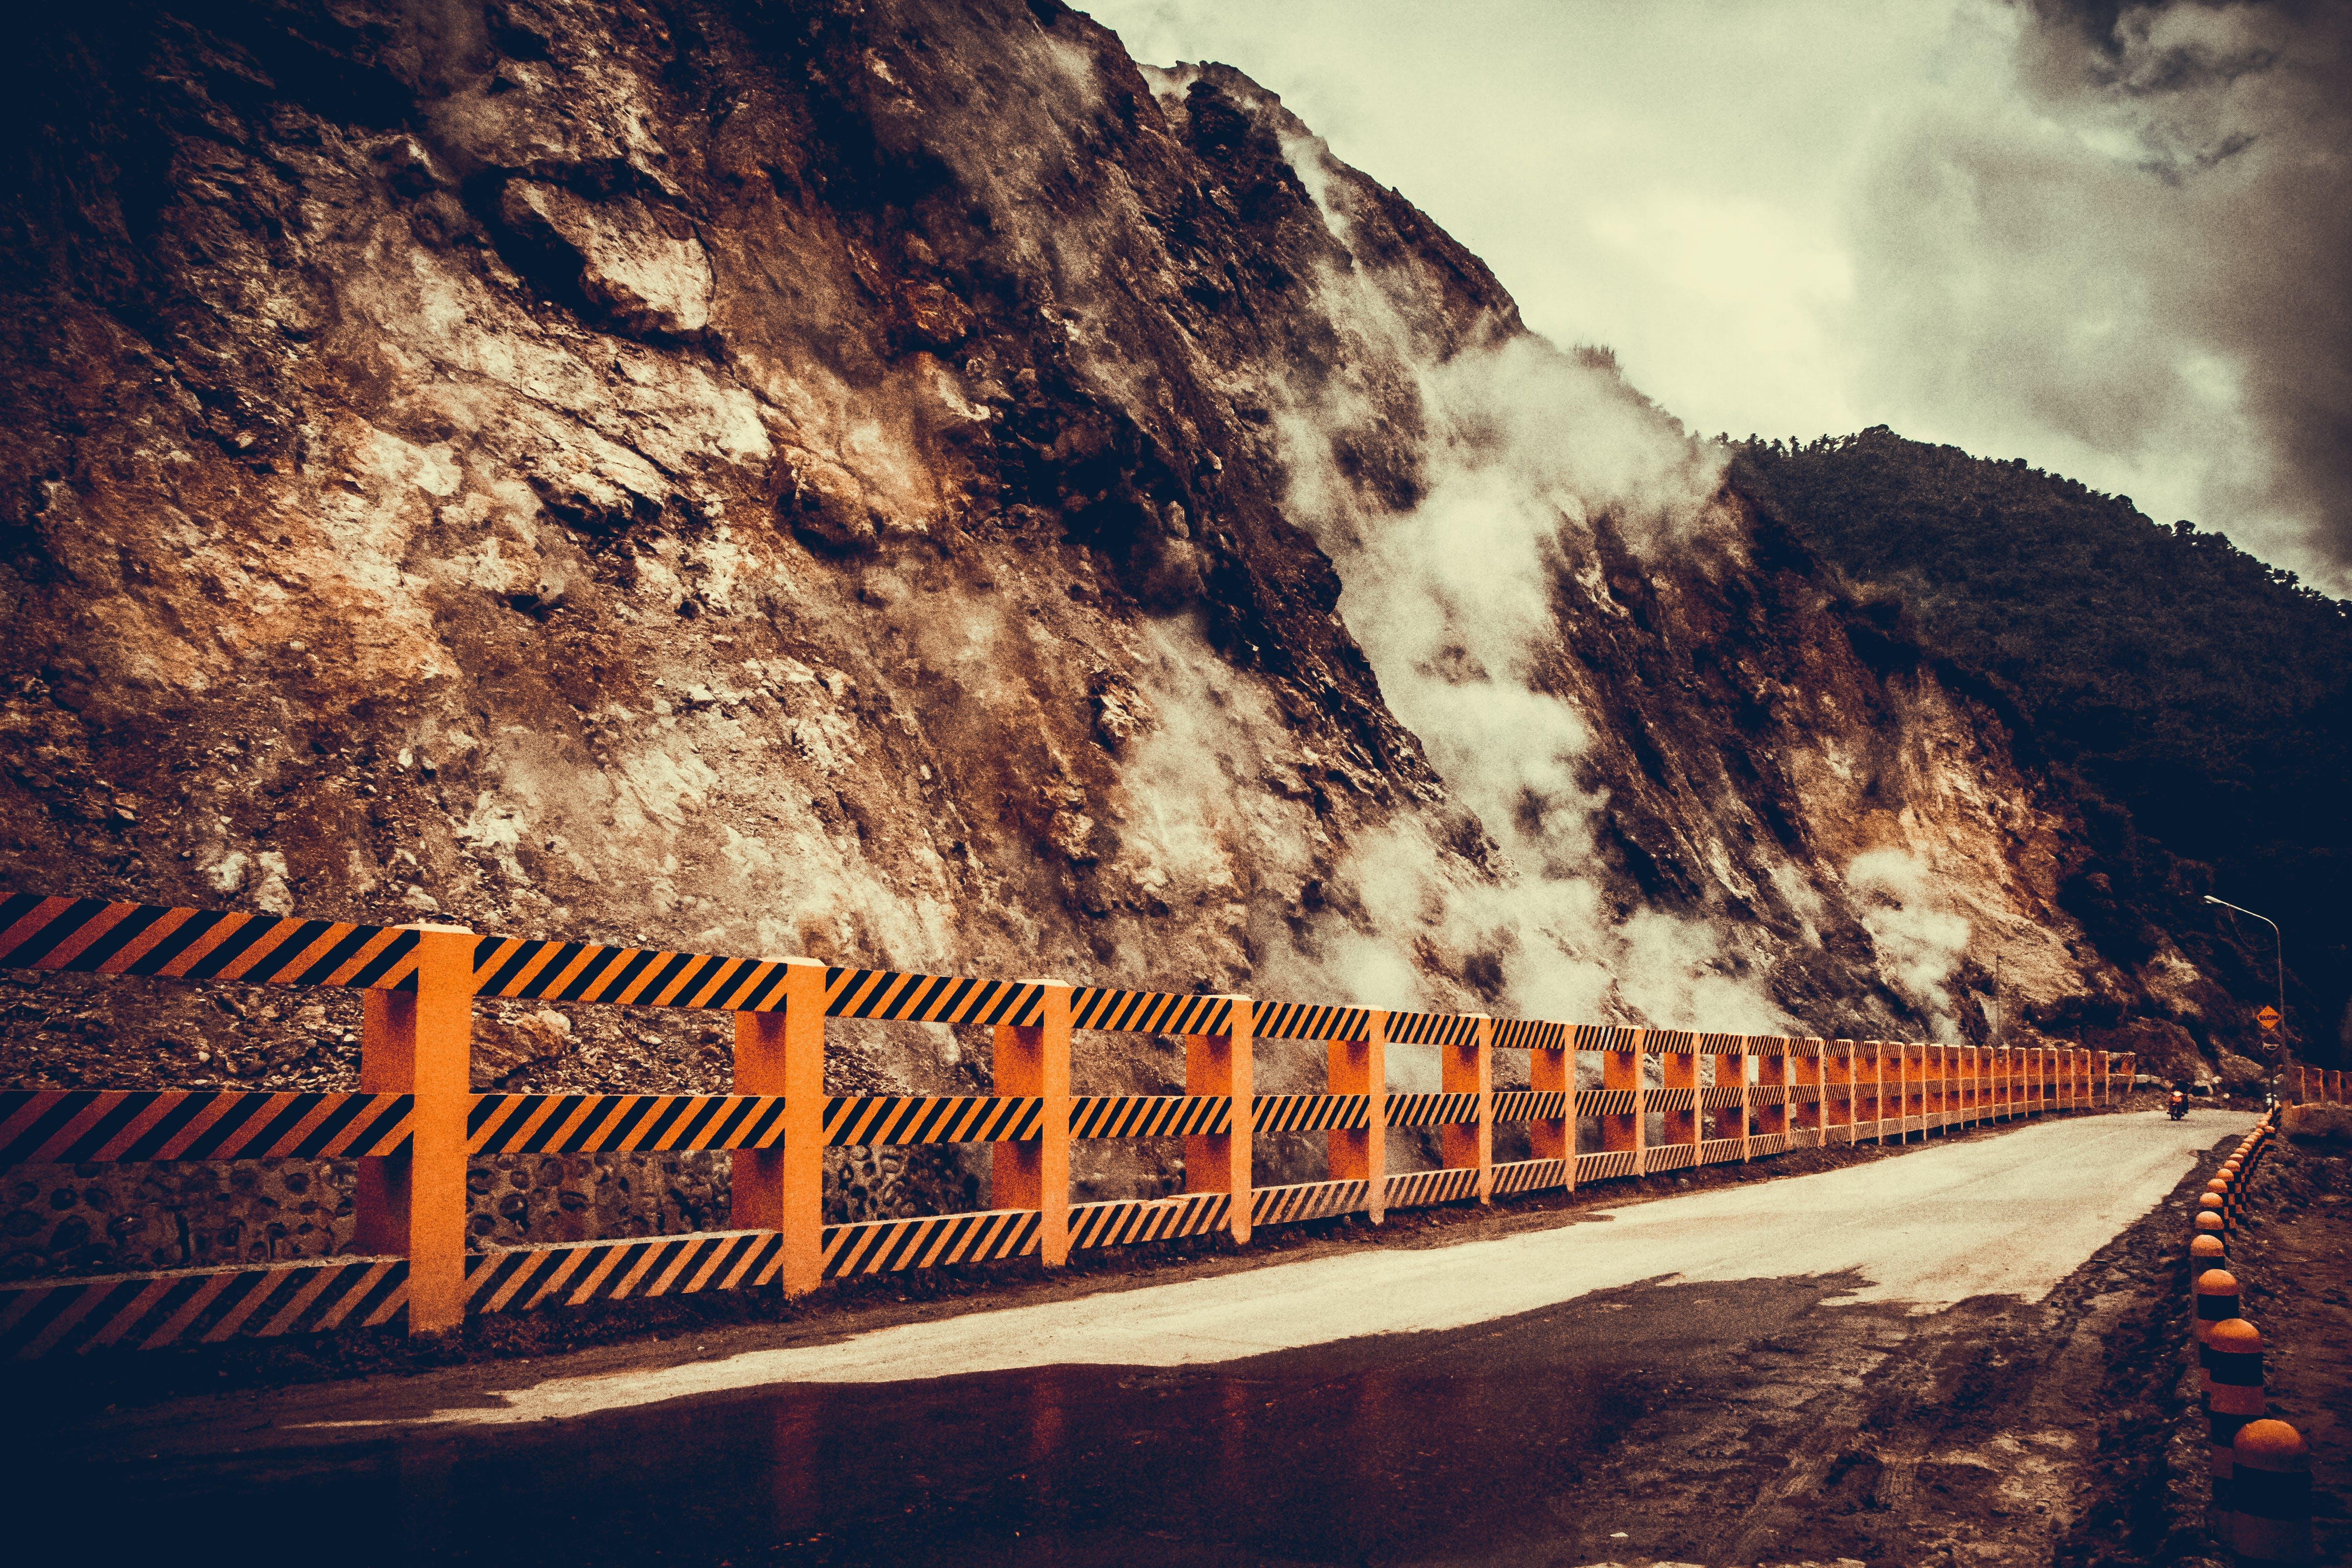 Concrete Road Near Mountain at Daytime